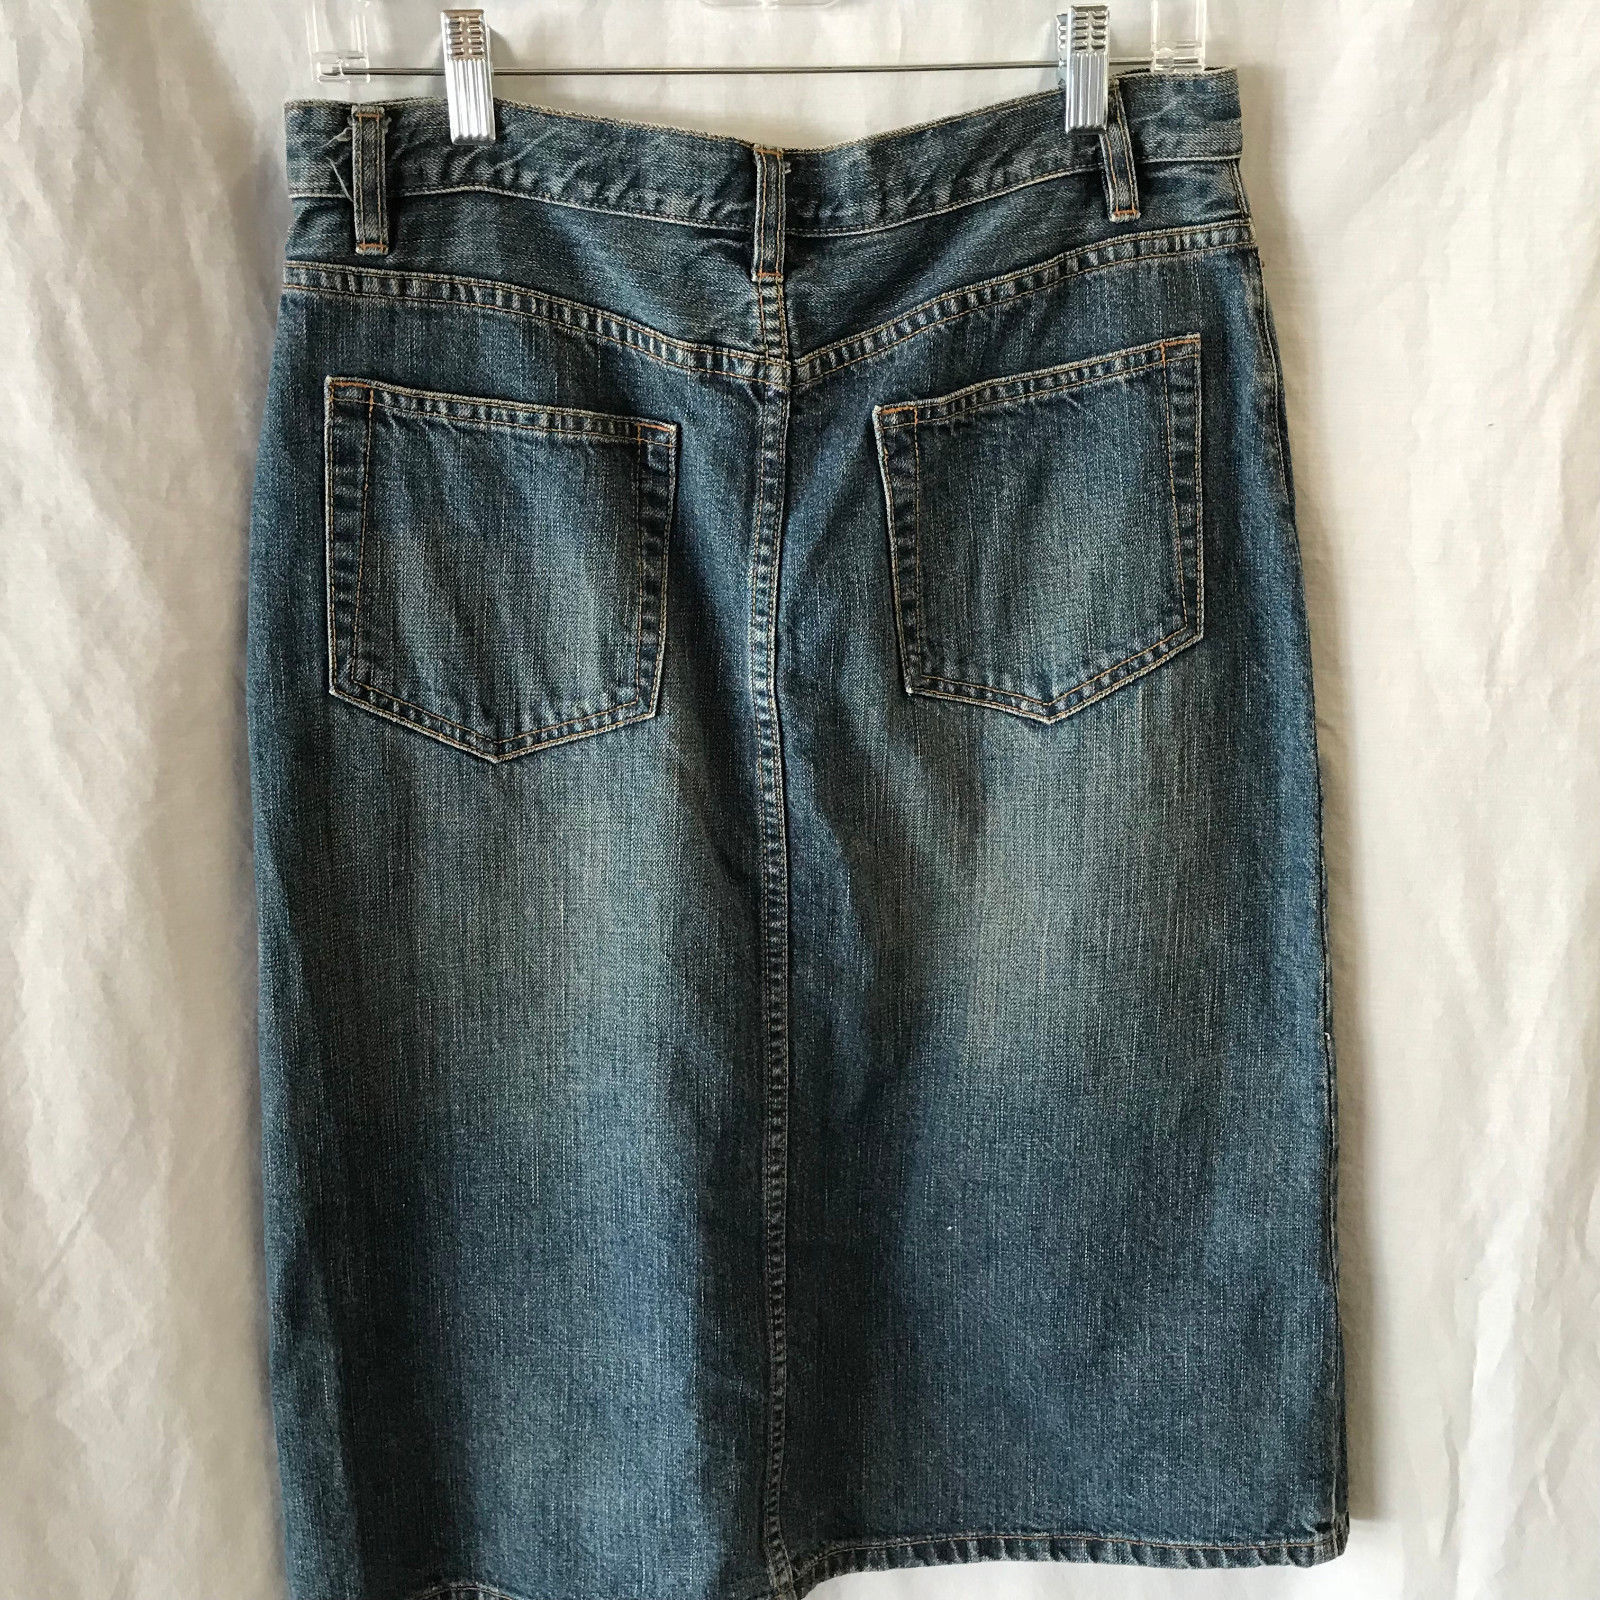 672c0b616 Gap Jeans Denim Skirt Distressed Knee Length and 50 similar items